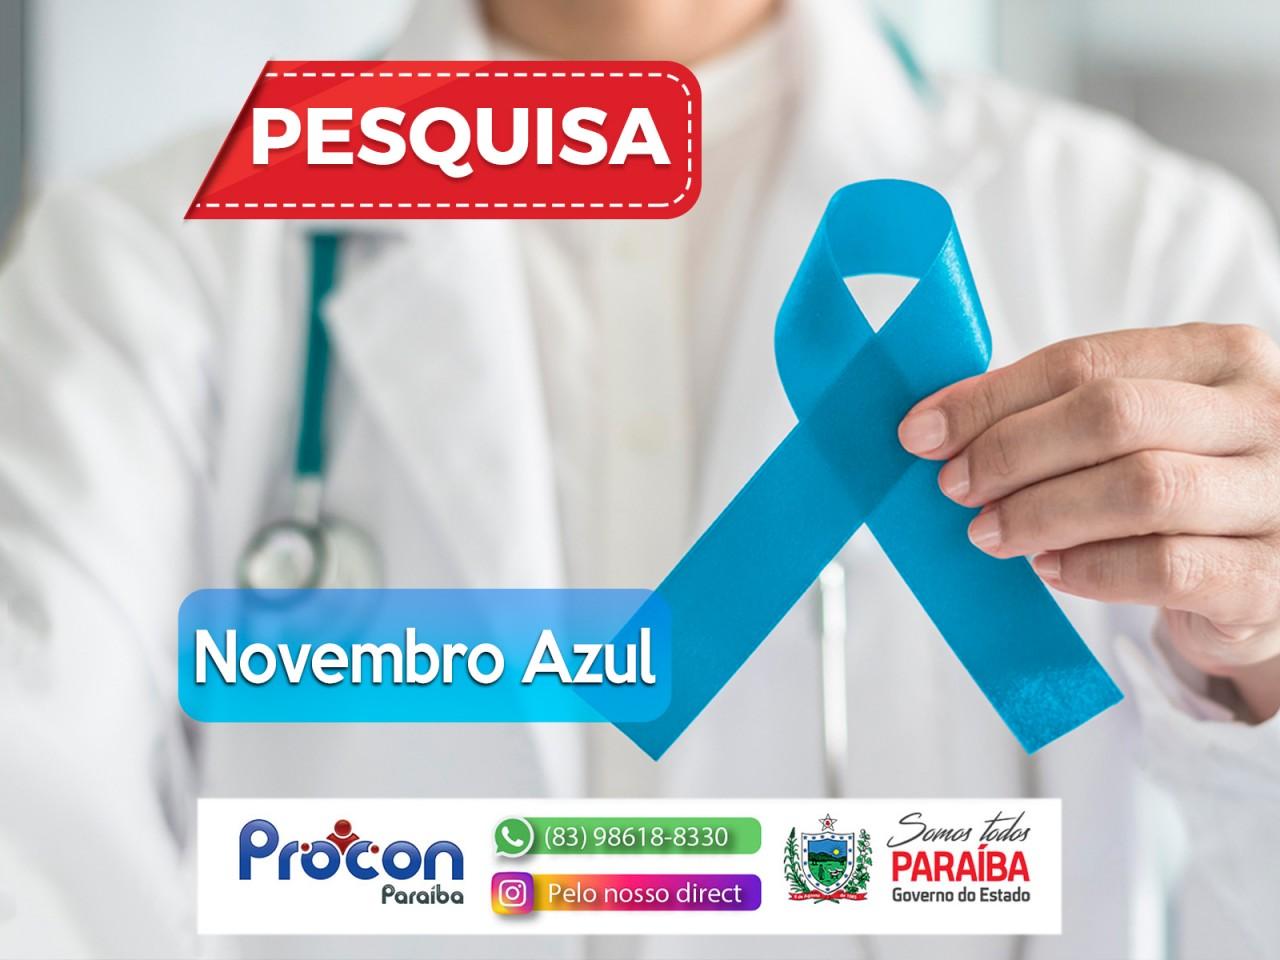 PESQUISA PROCON PB novembro azul - NOVEMBRO AZUL: Procon-PB realiza pesquisa de exames clínicos, laboratoriais e consultas médicas para o homem - CONFIR